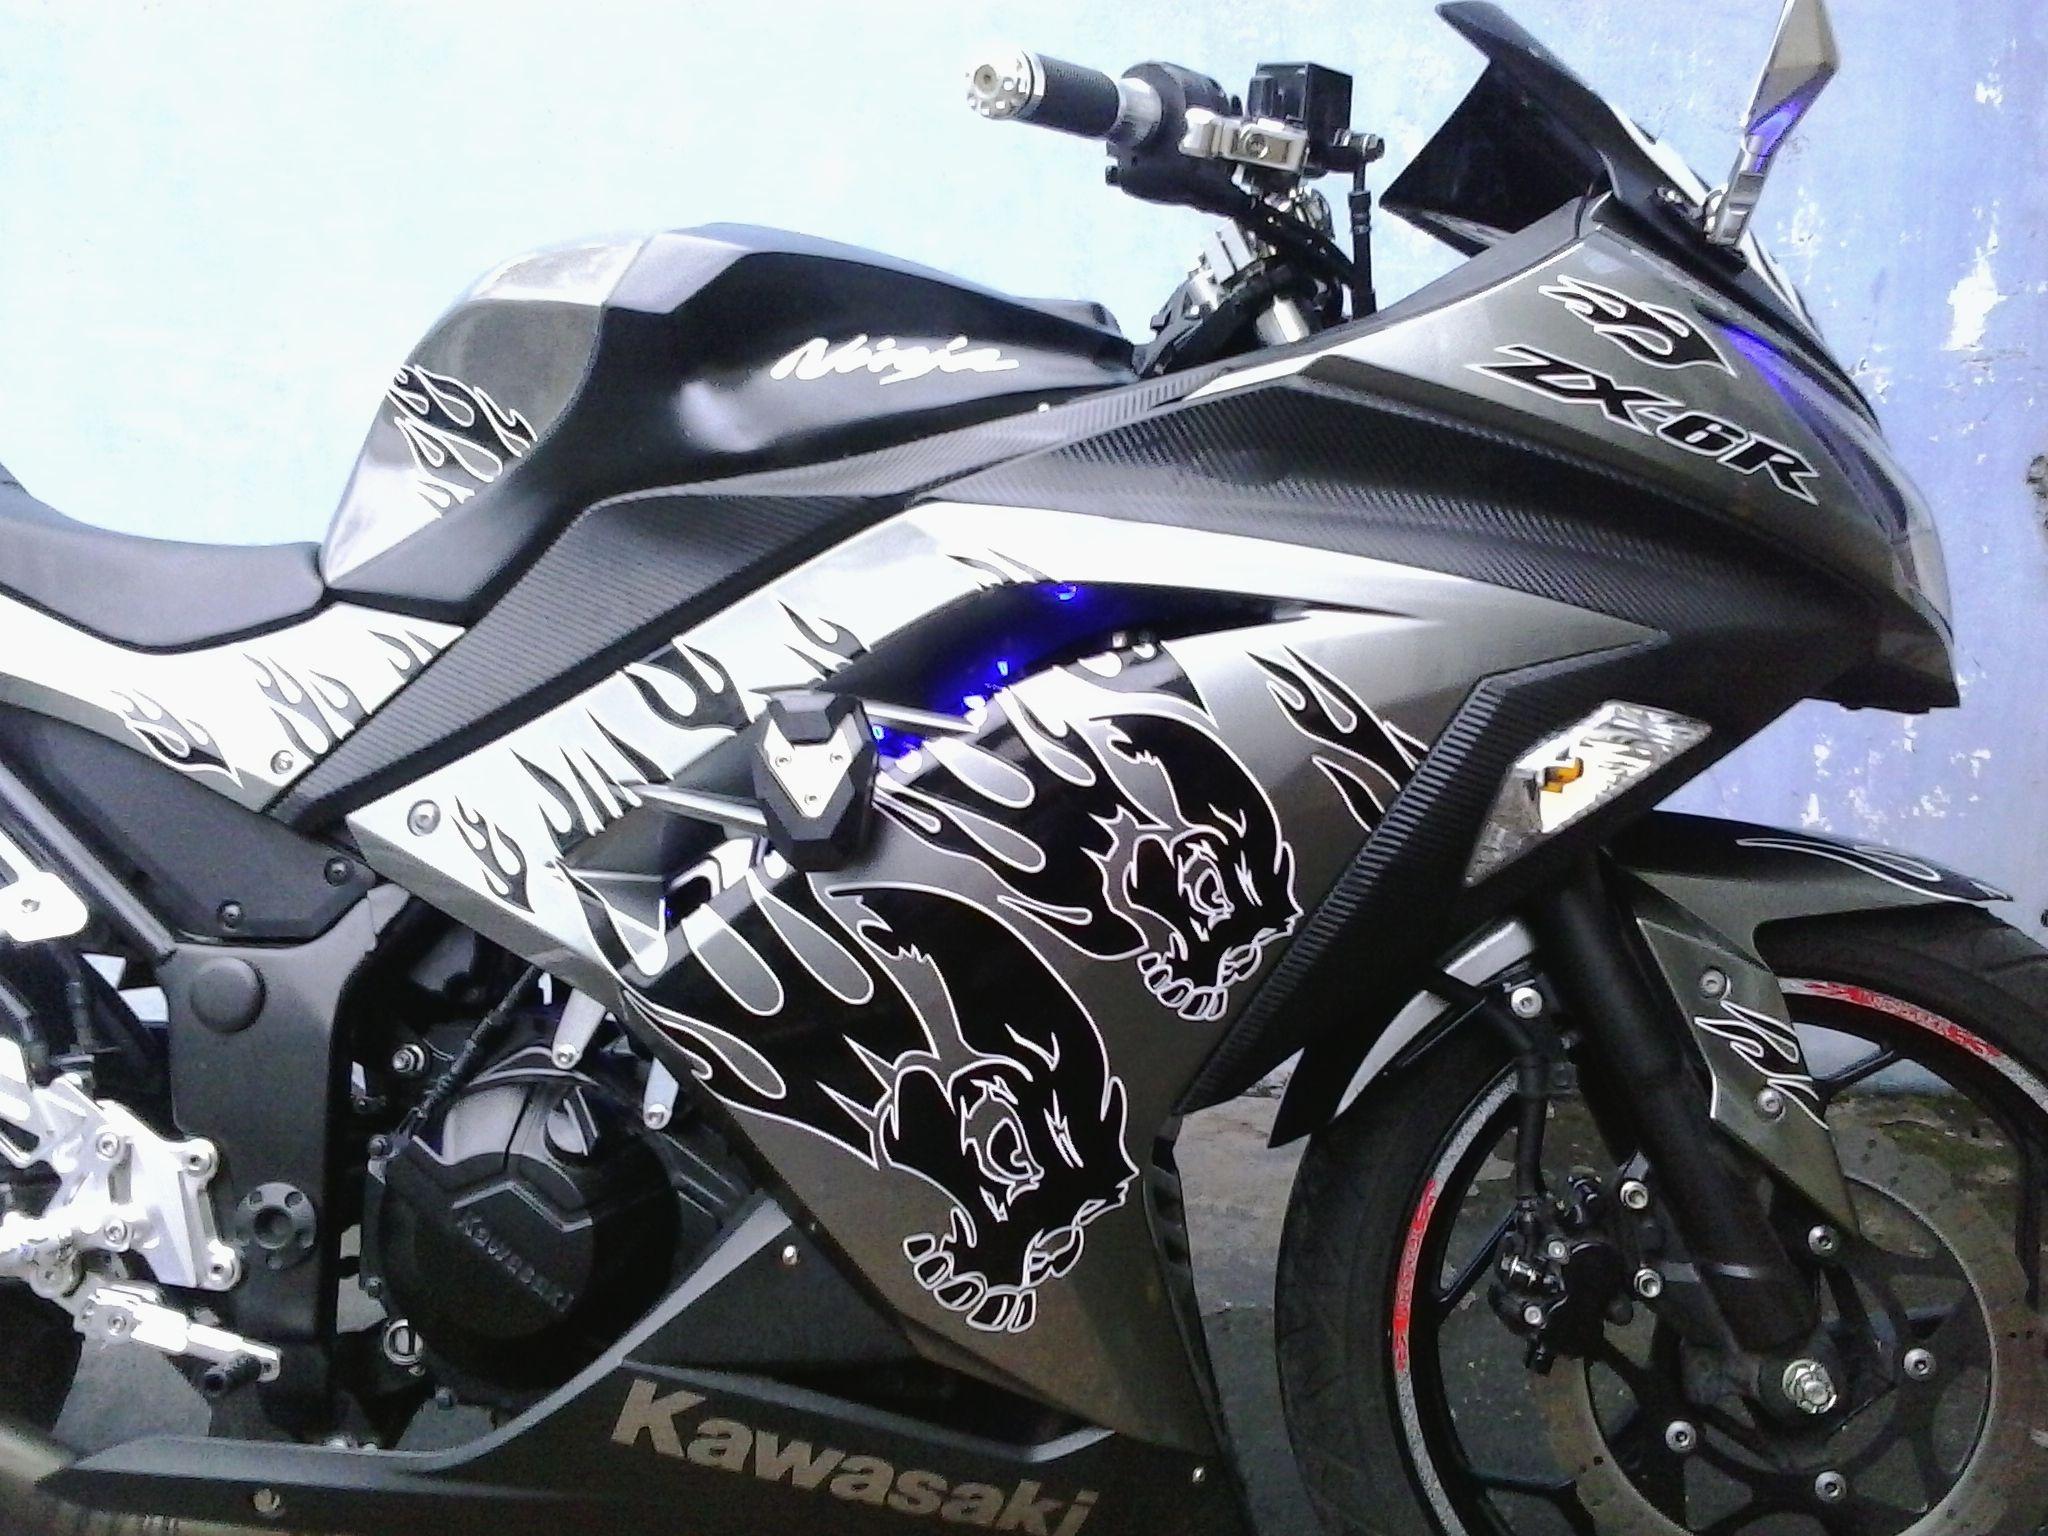 Design sticker ninja 250 - Kawasaki Ninja 250 F1 Black Skull Flame